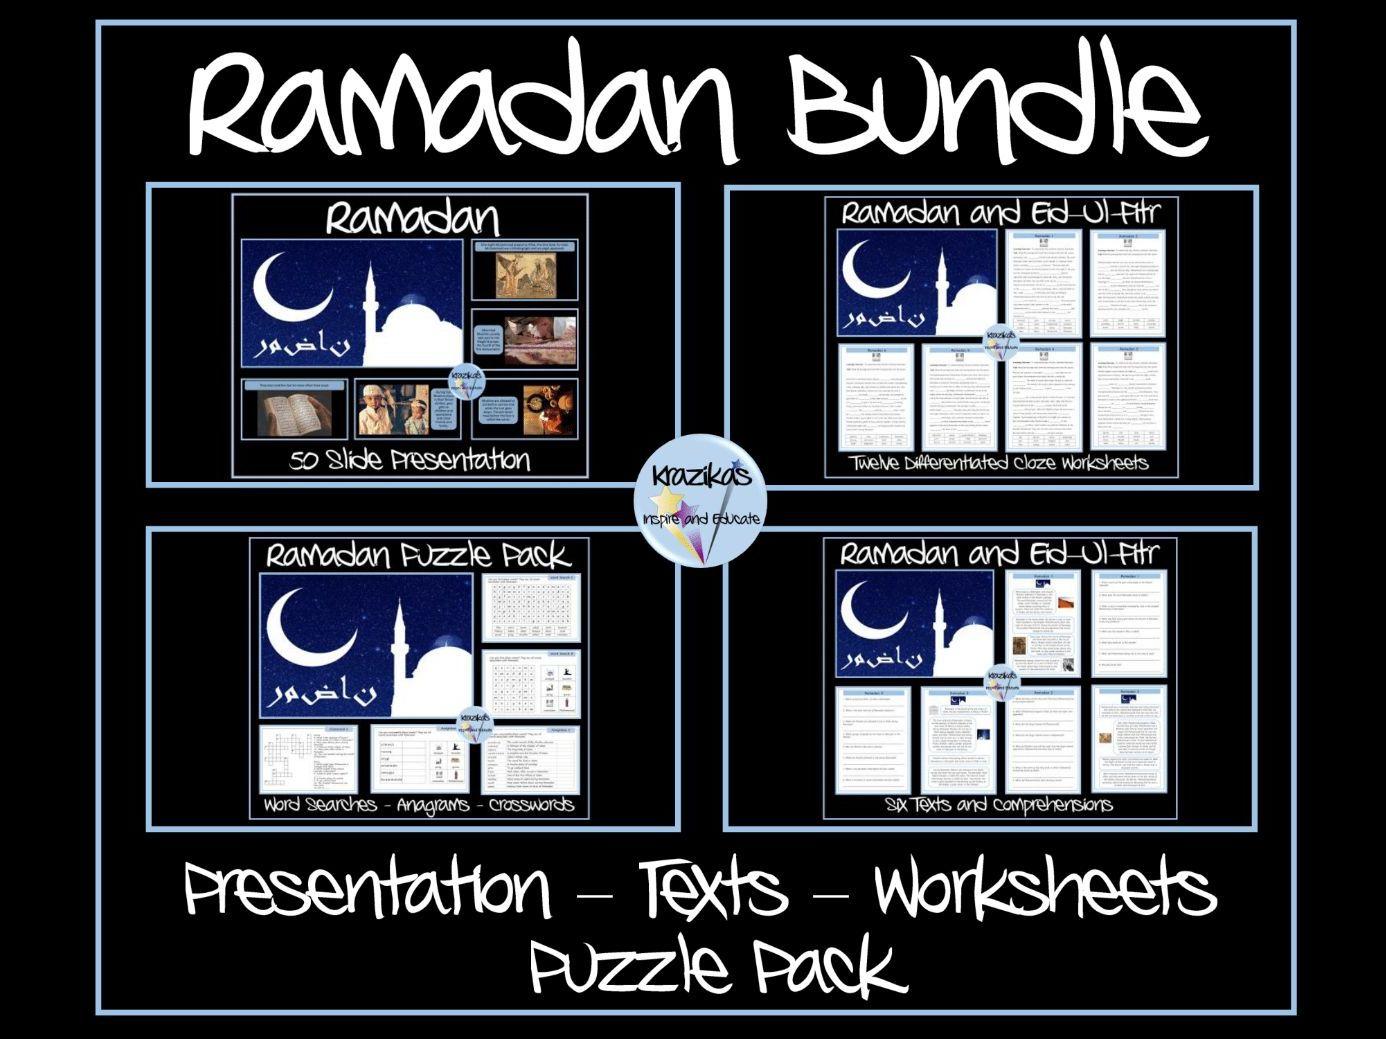 Ramadan and  Eid-Ul-Fitr